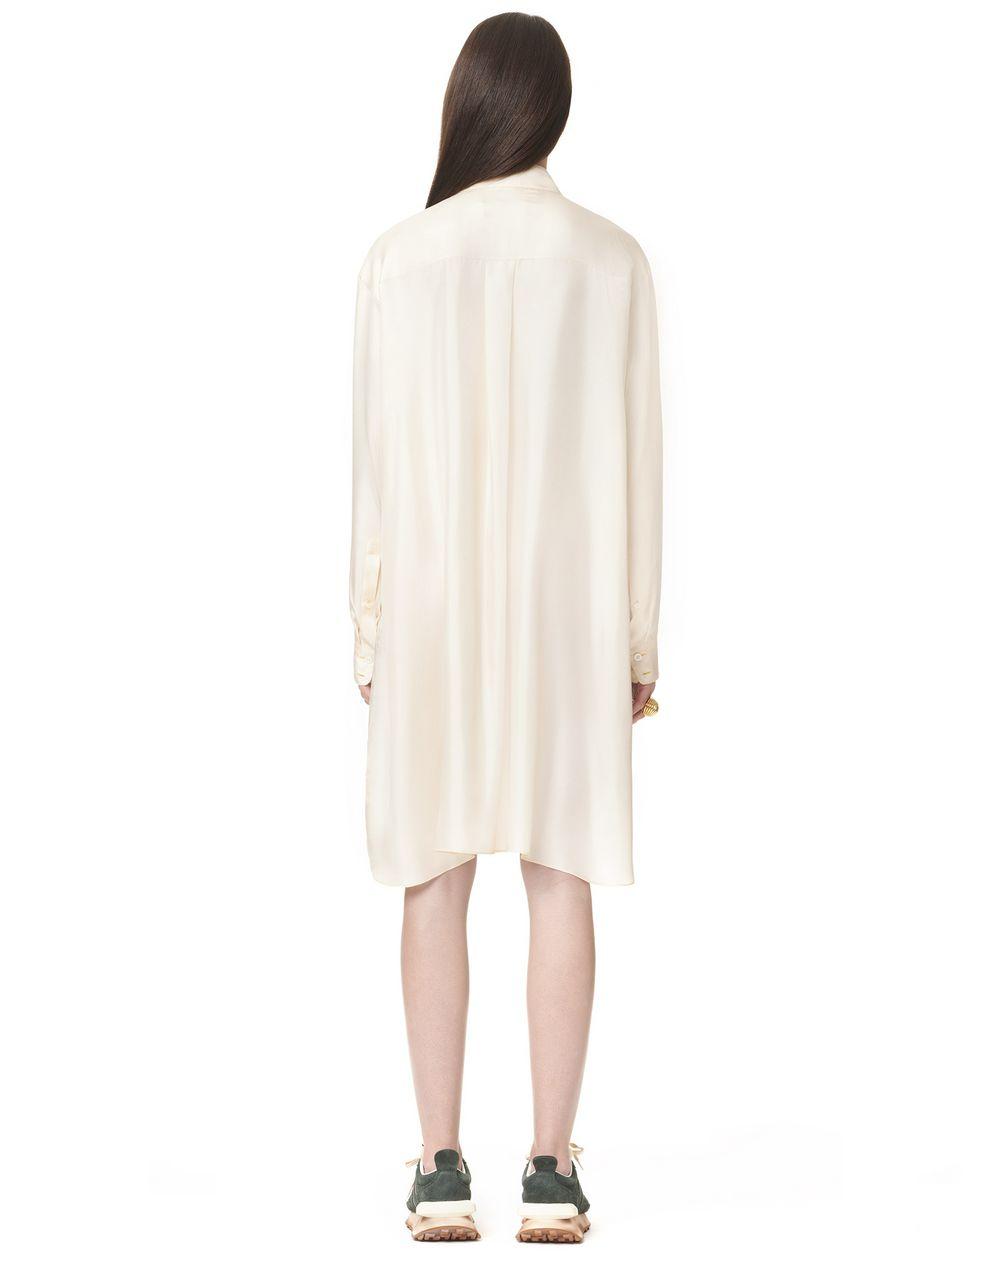 PRINTED SHIRT DRESS - Lanvin